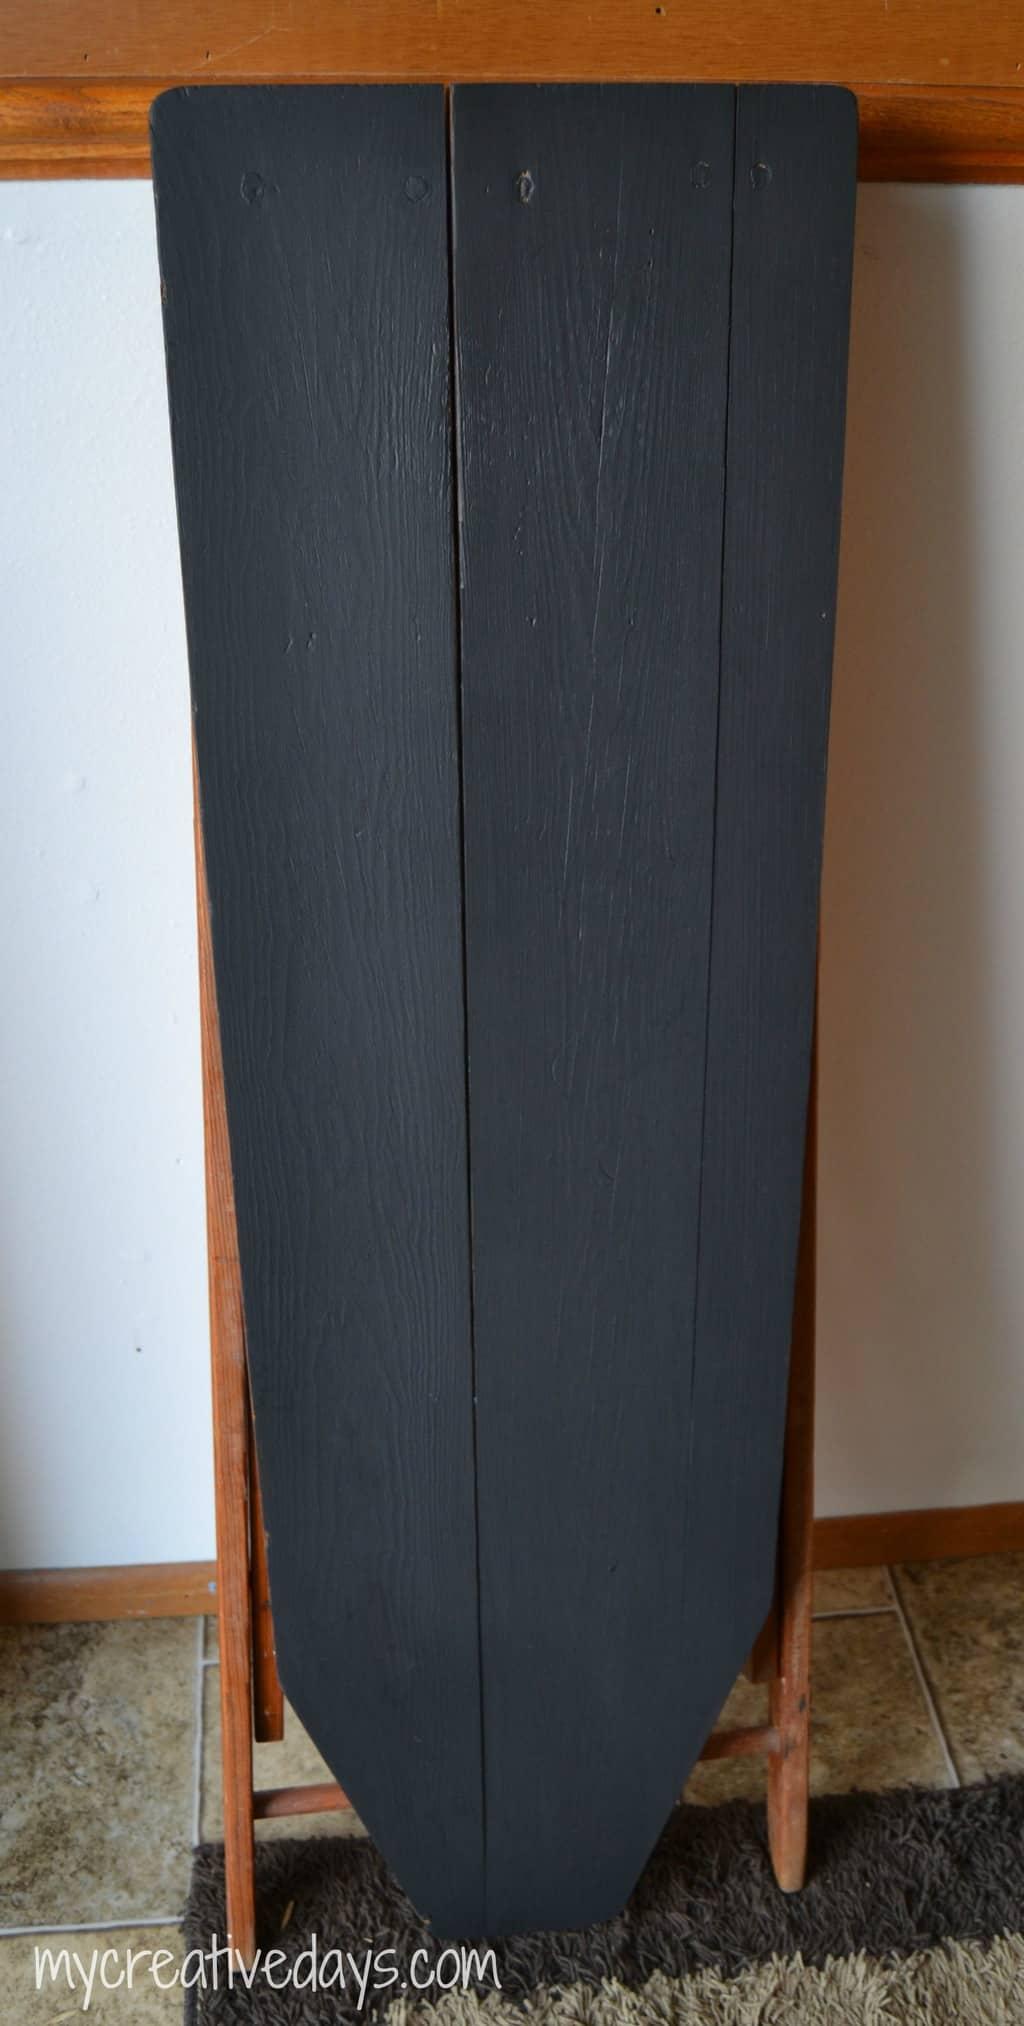 Repurposed Iron Board To Chalkboard mycreativedays.com